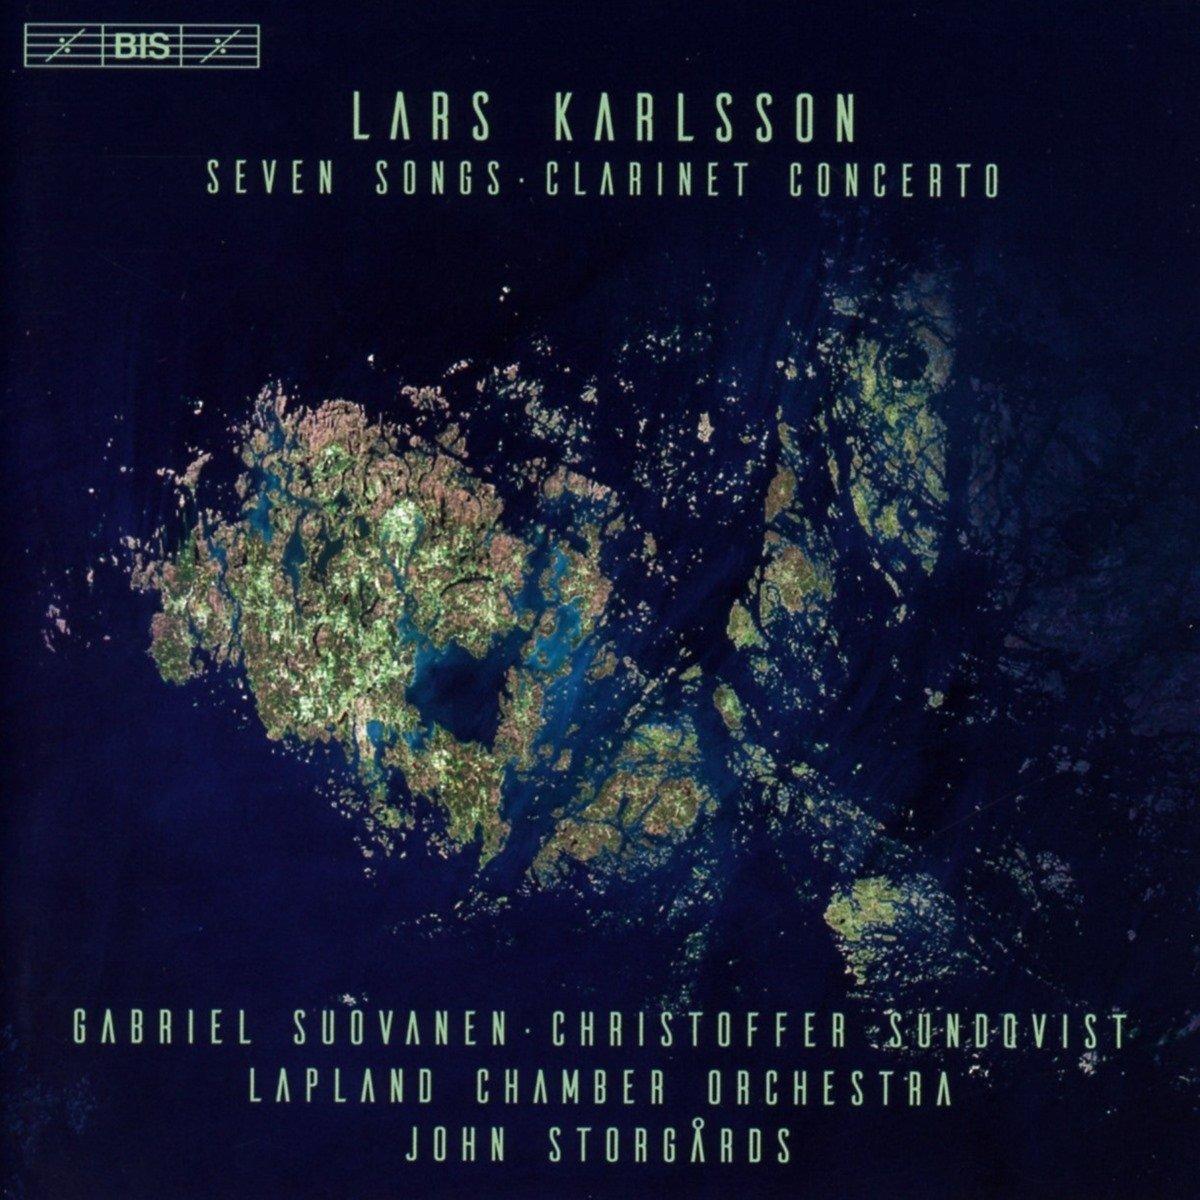 SACD : Suovanen - Gabriel - Lapland Chamber Orchestra - Storgårds - John - Sundqvist - Christoffer - Seven Songs & Clarinet Concerto (Hybrid SACD)